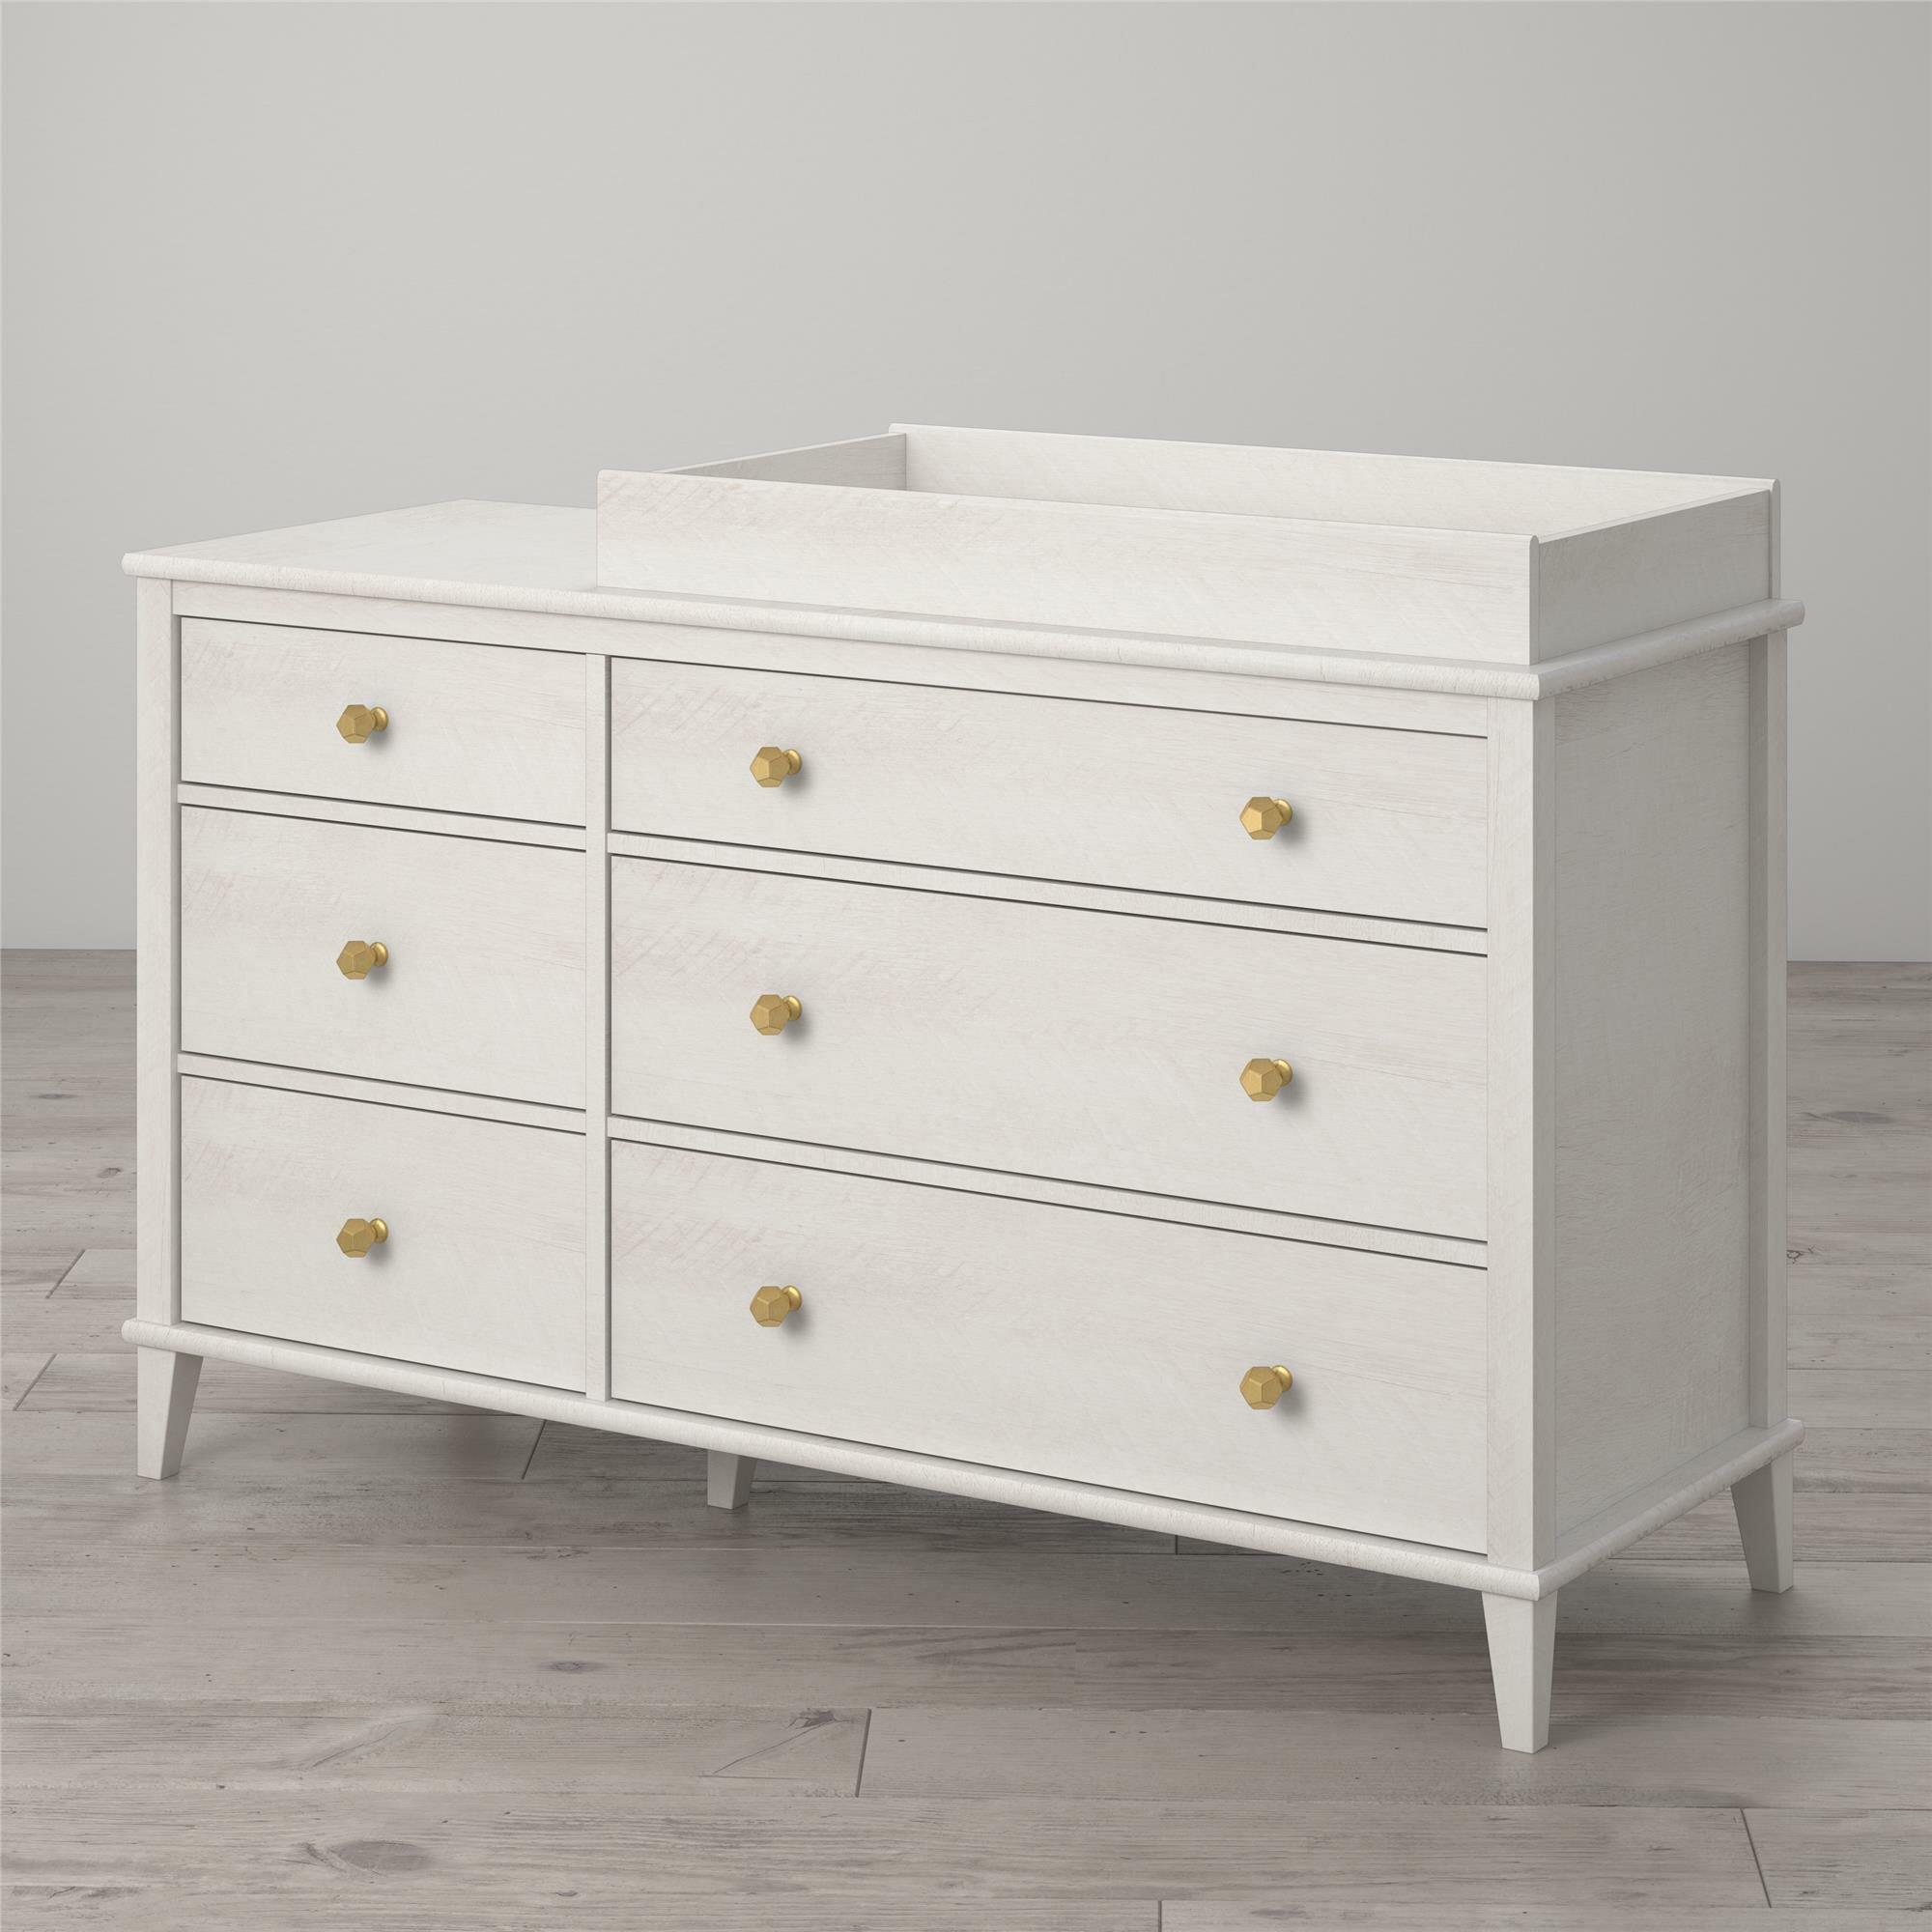 Amazing Monarch Hill Poppy Changing Table Dresser Download Free Architecture Designs Intelgarnamadebymaigaardcom